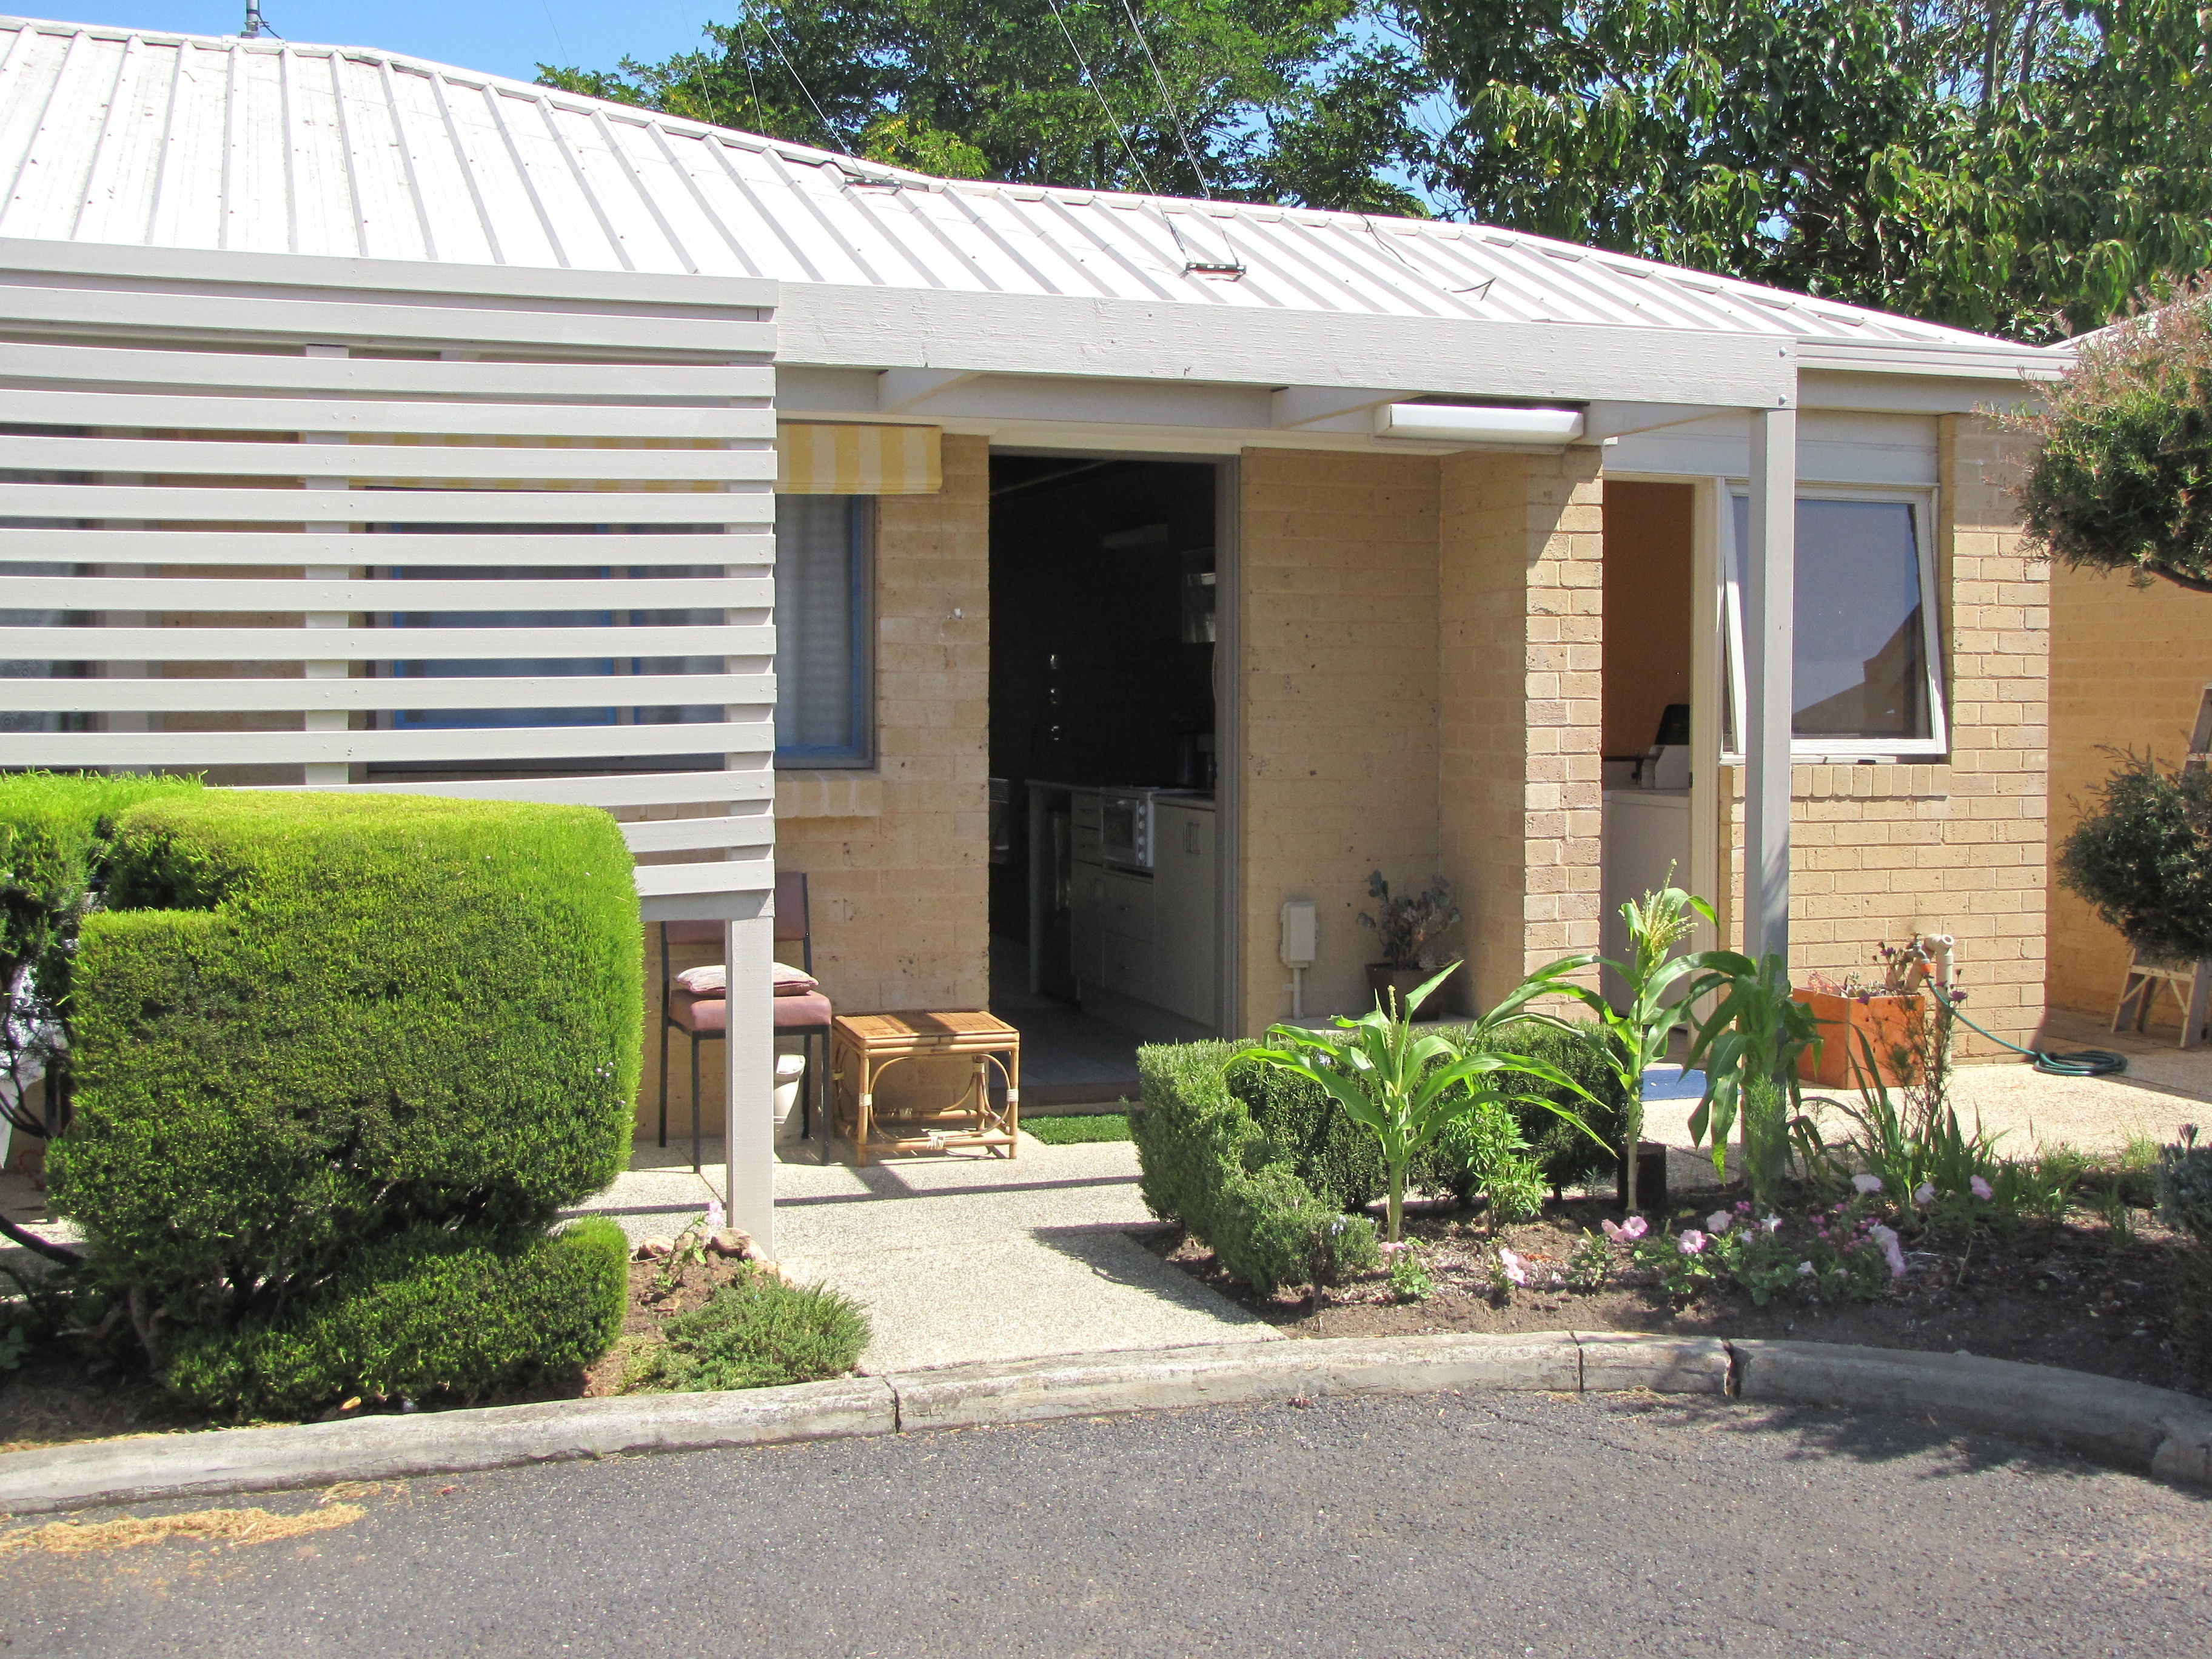 6/19 Lake Avenue, Ocean Grove VIC 3226